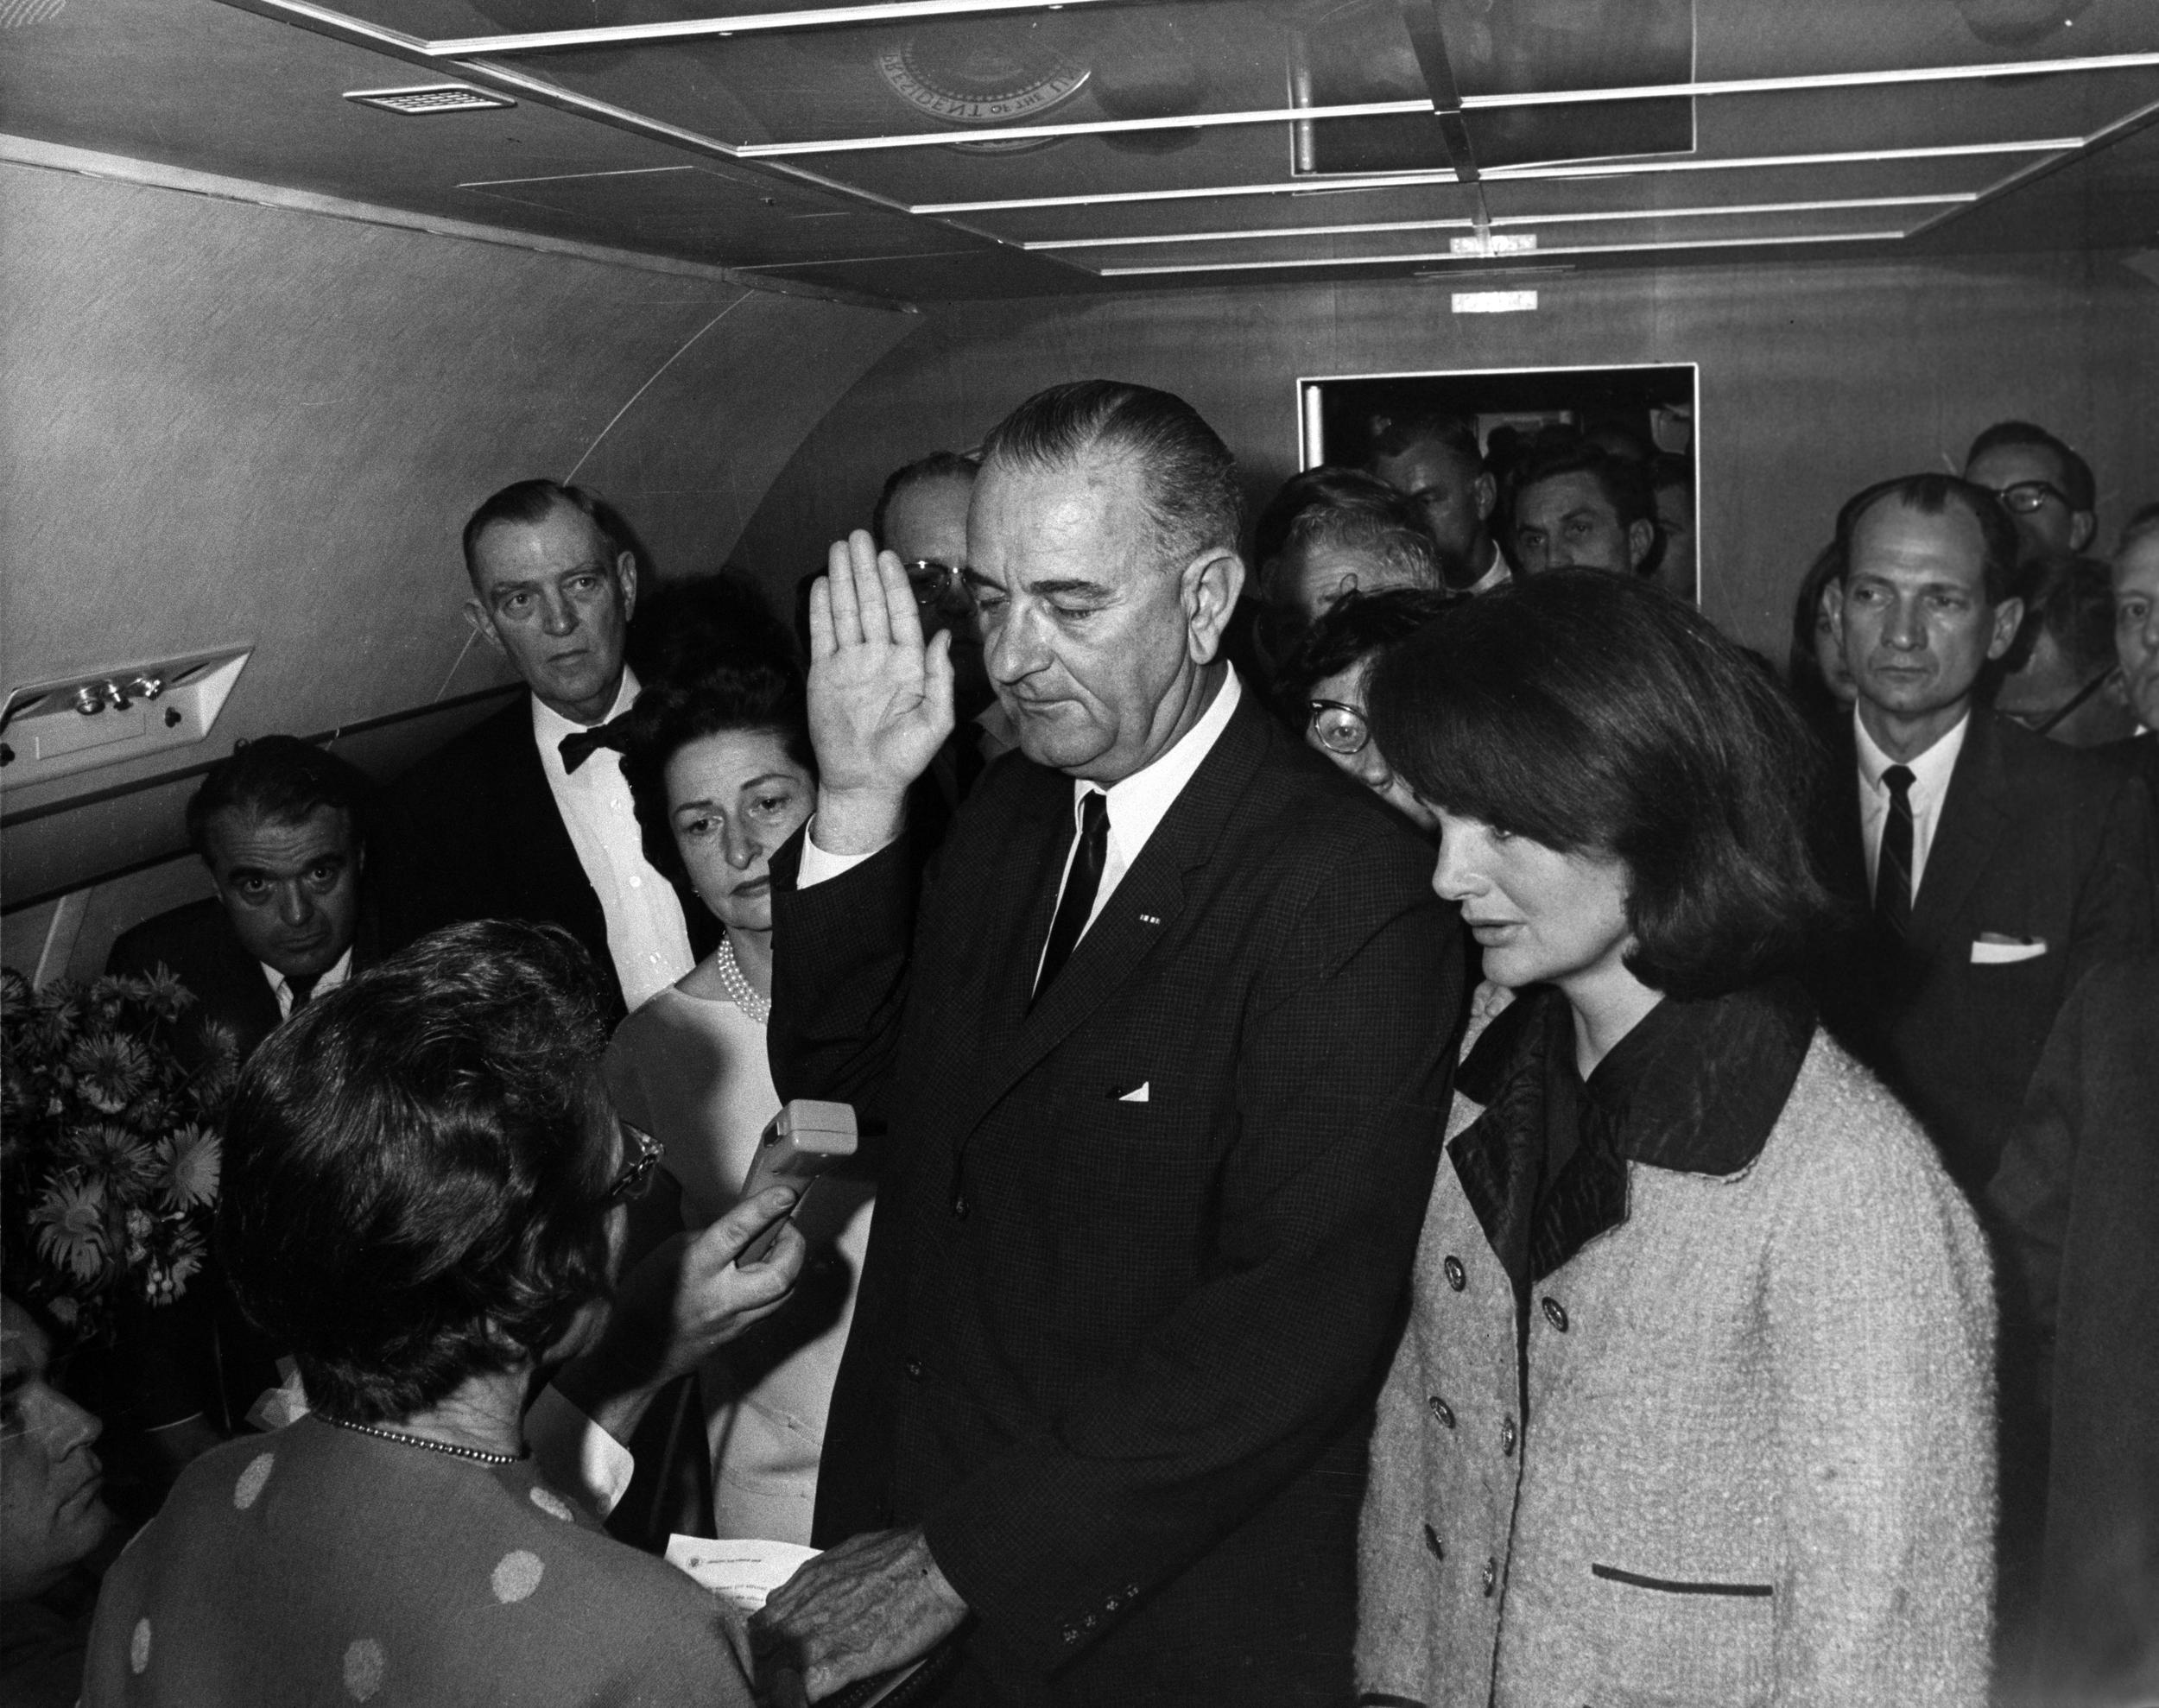 <em>Lyndon Johnson sworn in as president on Air Force One, Nov. 22, 1963</em>   <em>(Wikimedia Commons/Cecil W. Stoughton)</em>